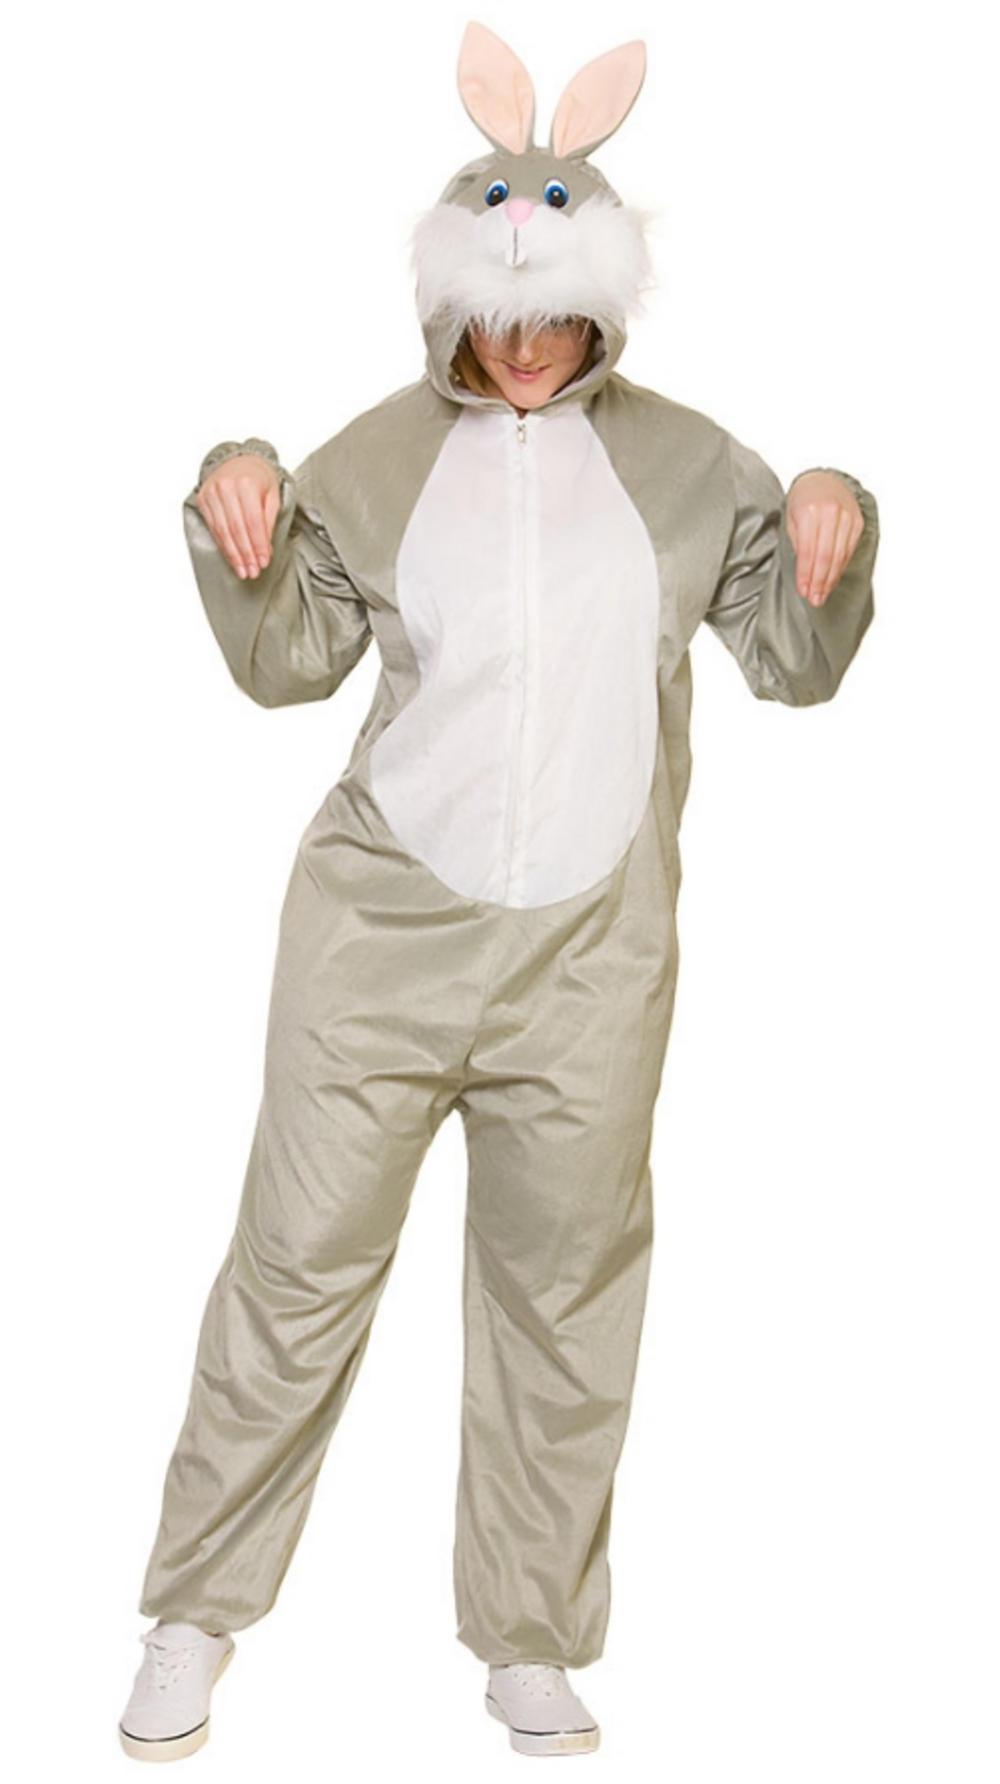 Deluxe Adult Bunny